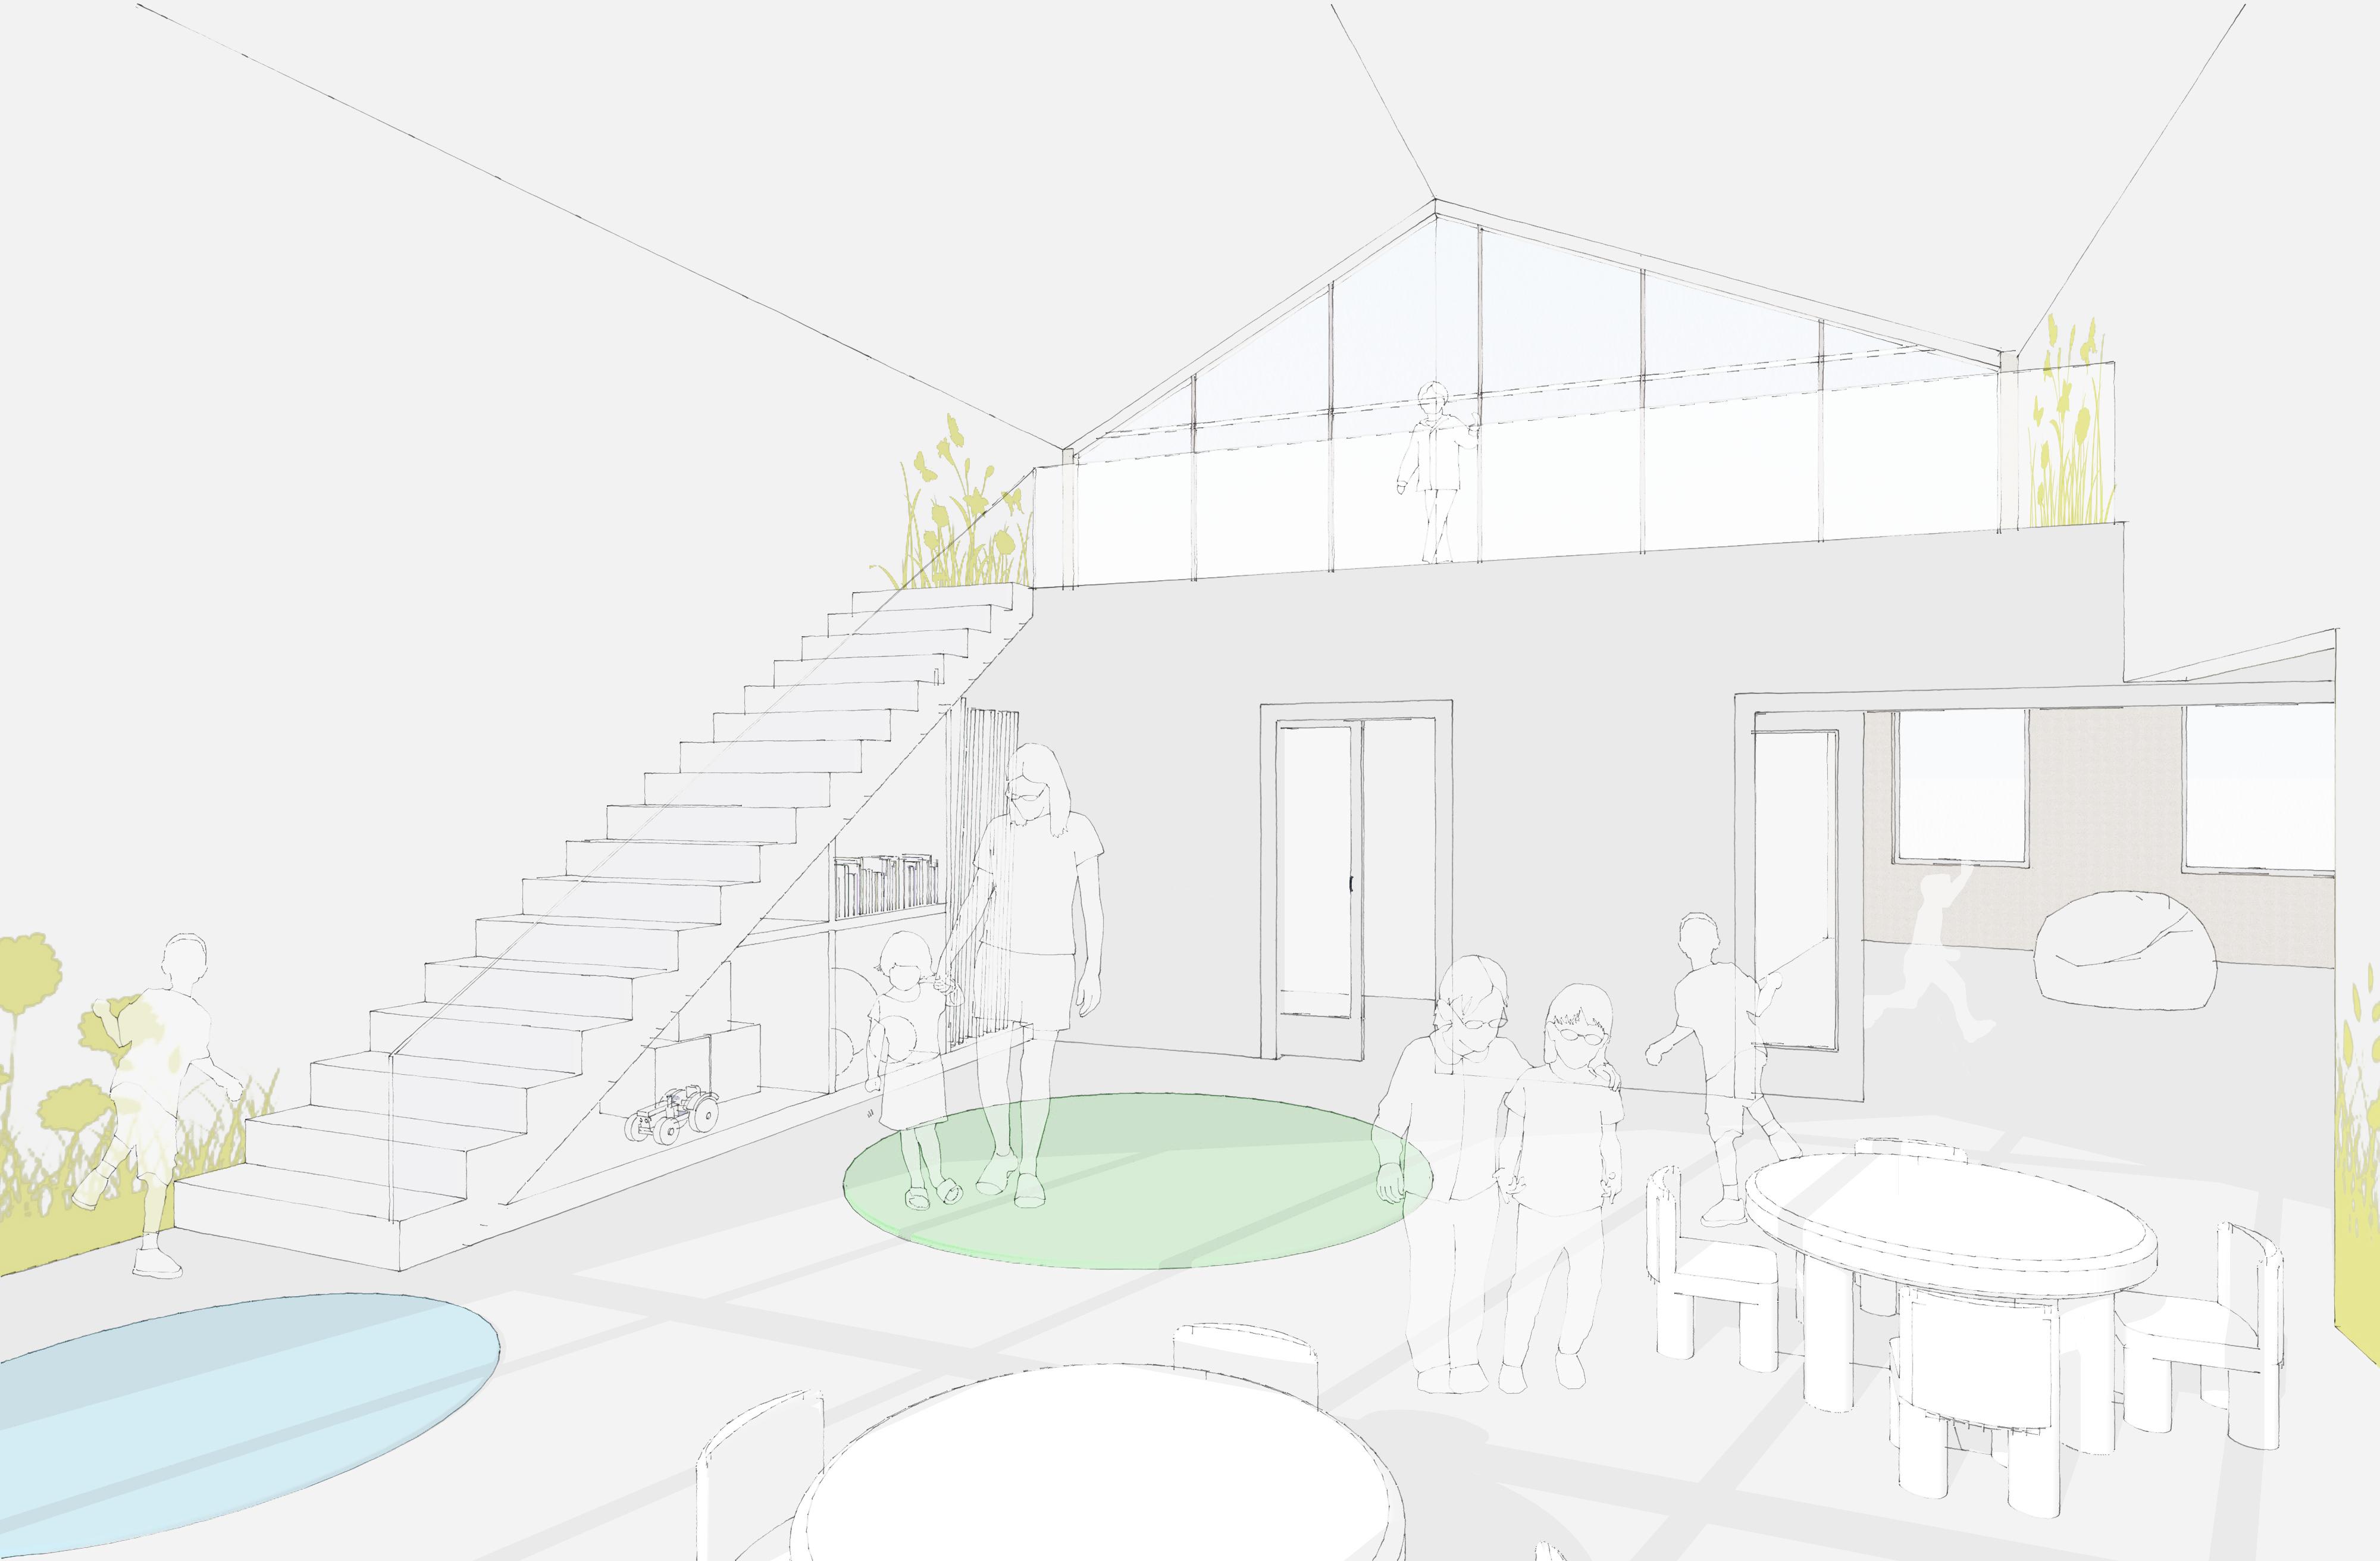 Innenraumperspektive, Kindertagesstätte, Großenhain